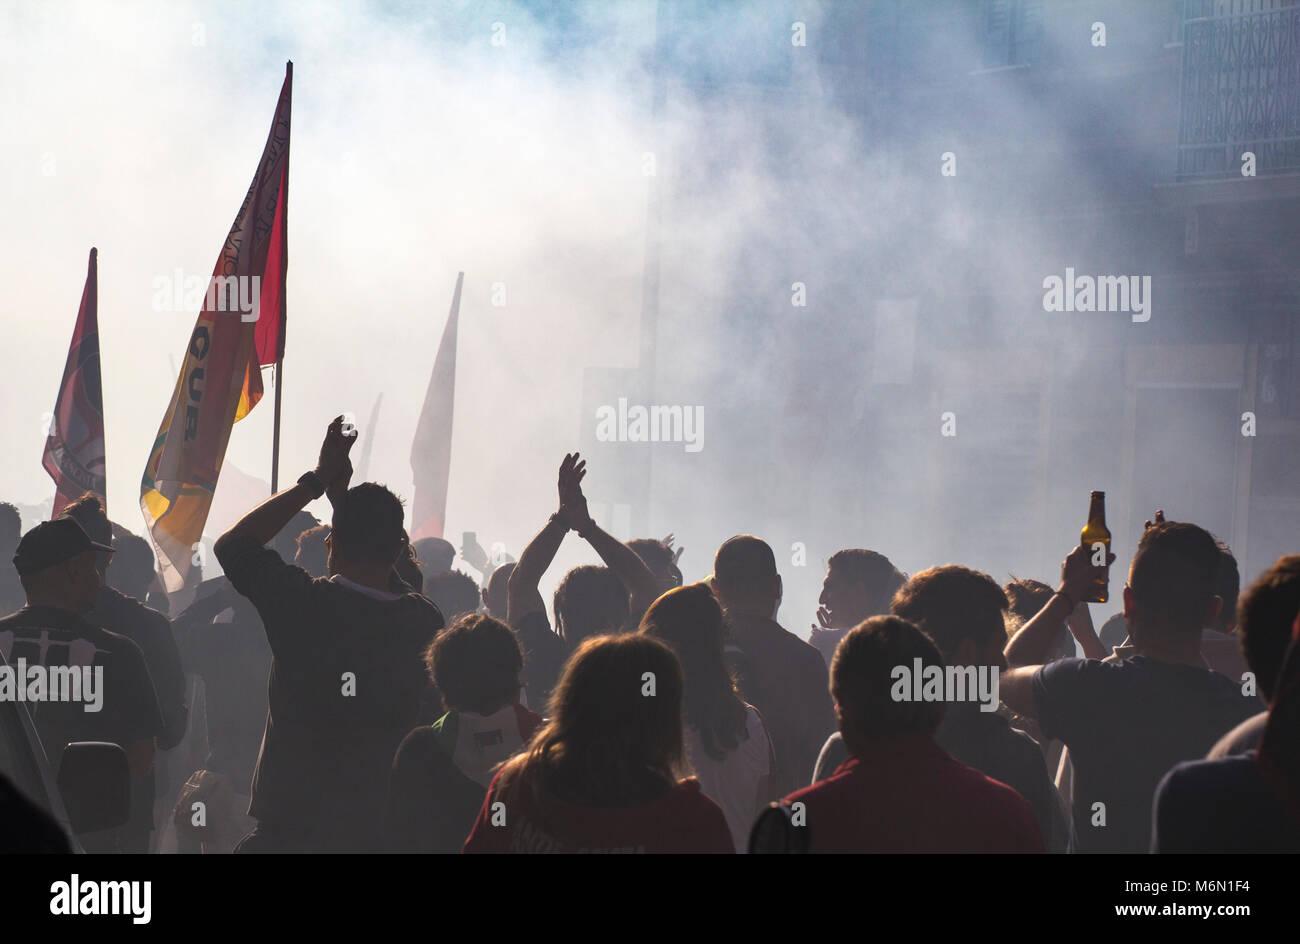 Savona, Italy - October 15, 2017: Popular anti-racist demonstration, organized in the City of Savona. - Stock Image